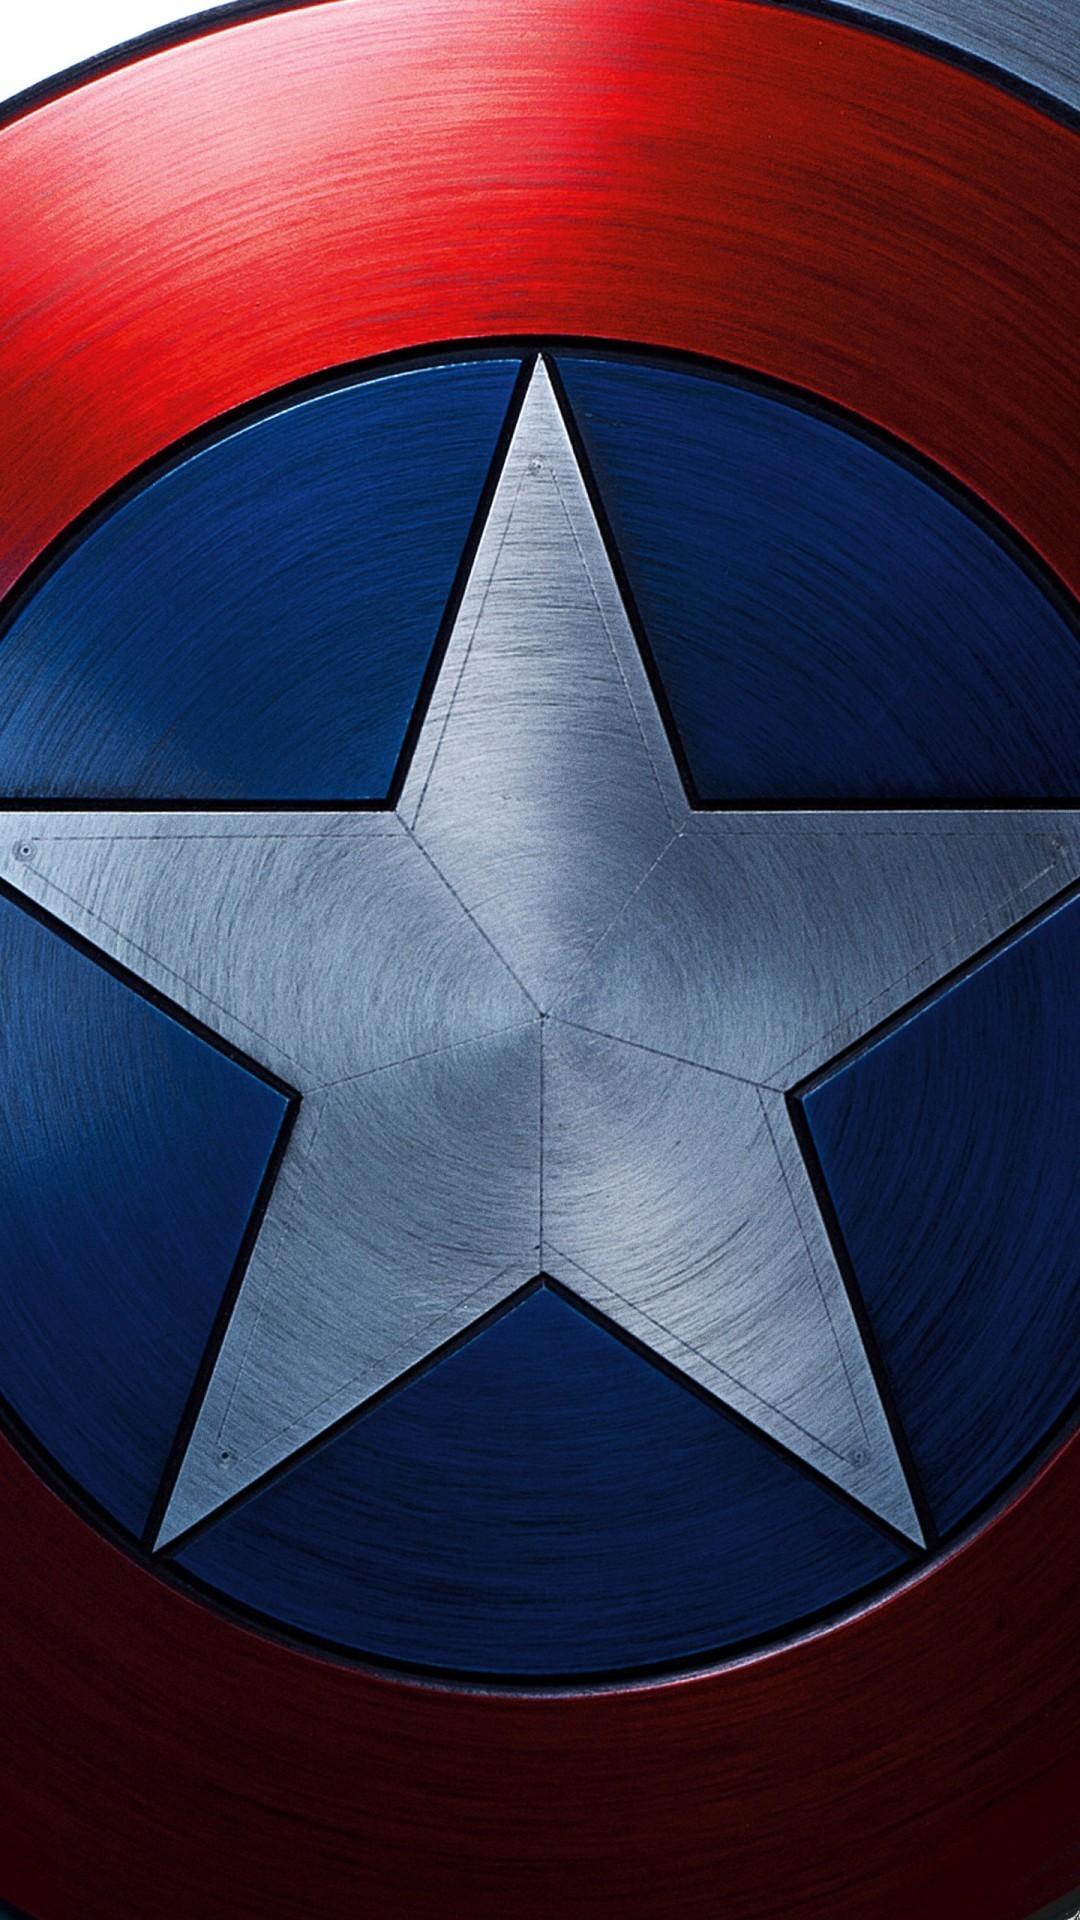 Captain America's Shield | wallpaper | Pinterest | Capt america and Rock